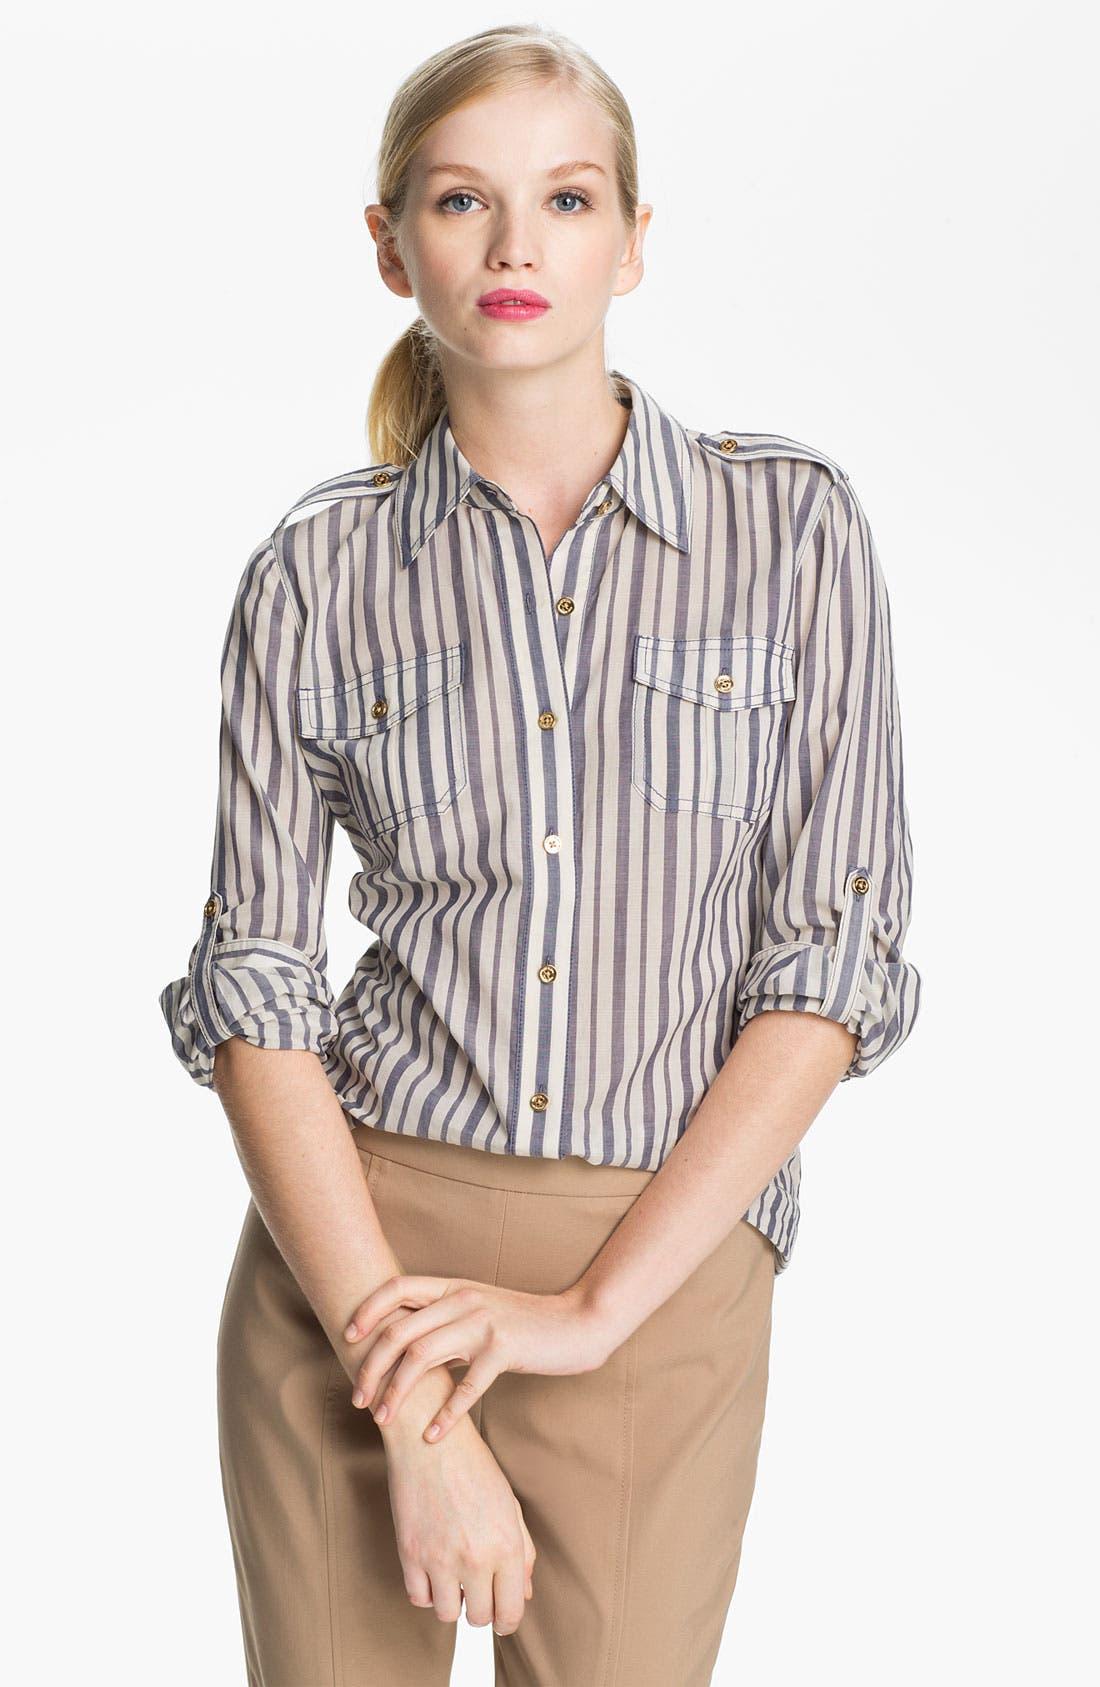 Alternate Image 1 Selected - Tory Burch 'Brigitte' Cotton Shirt